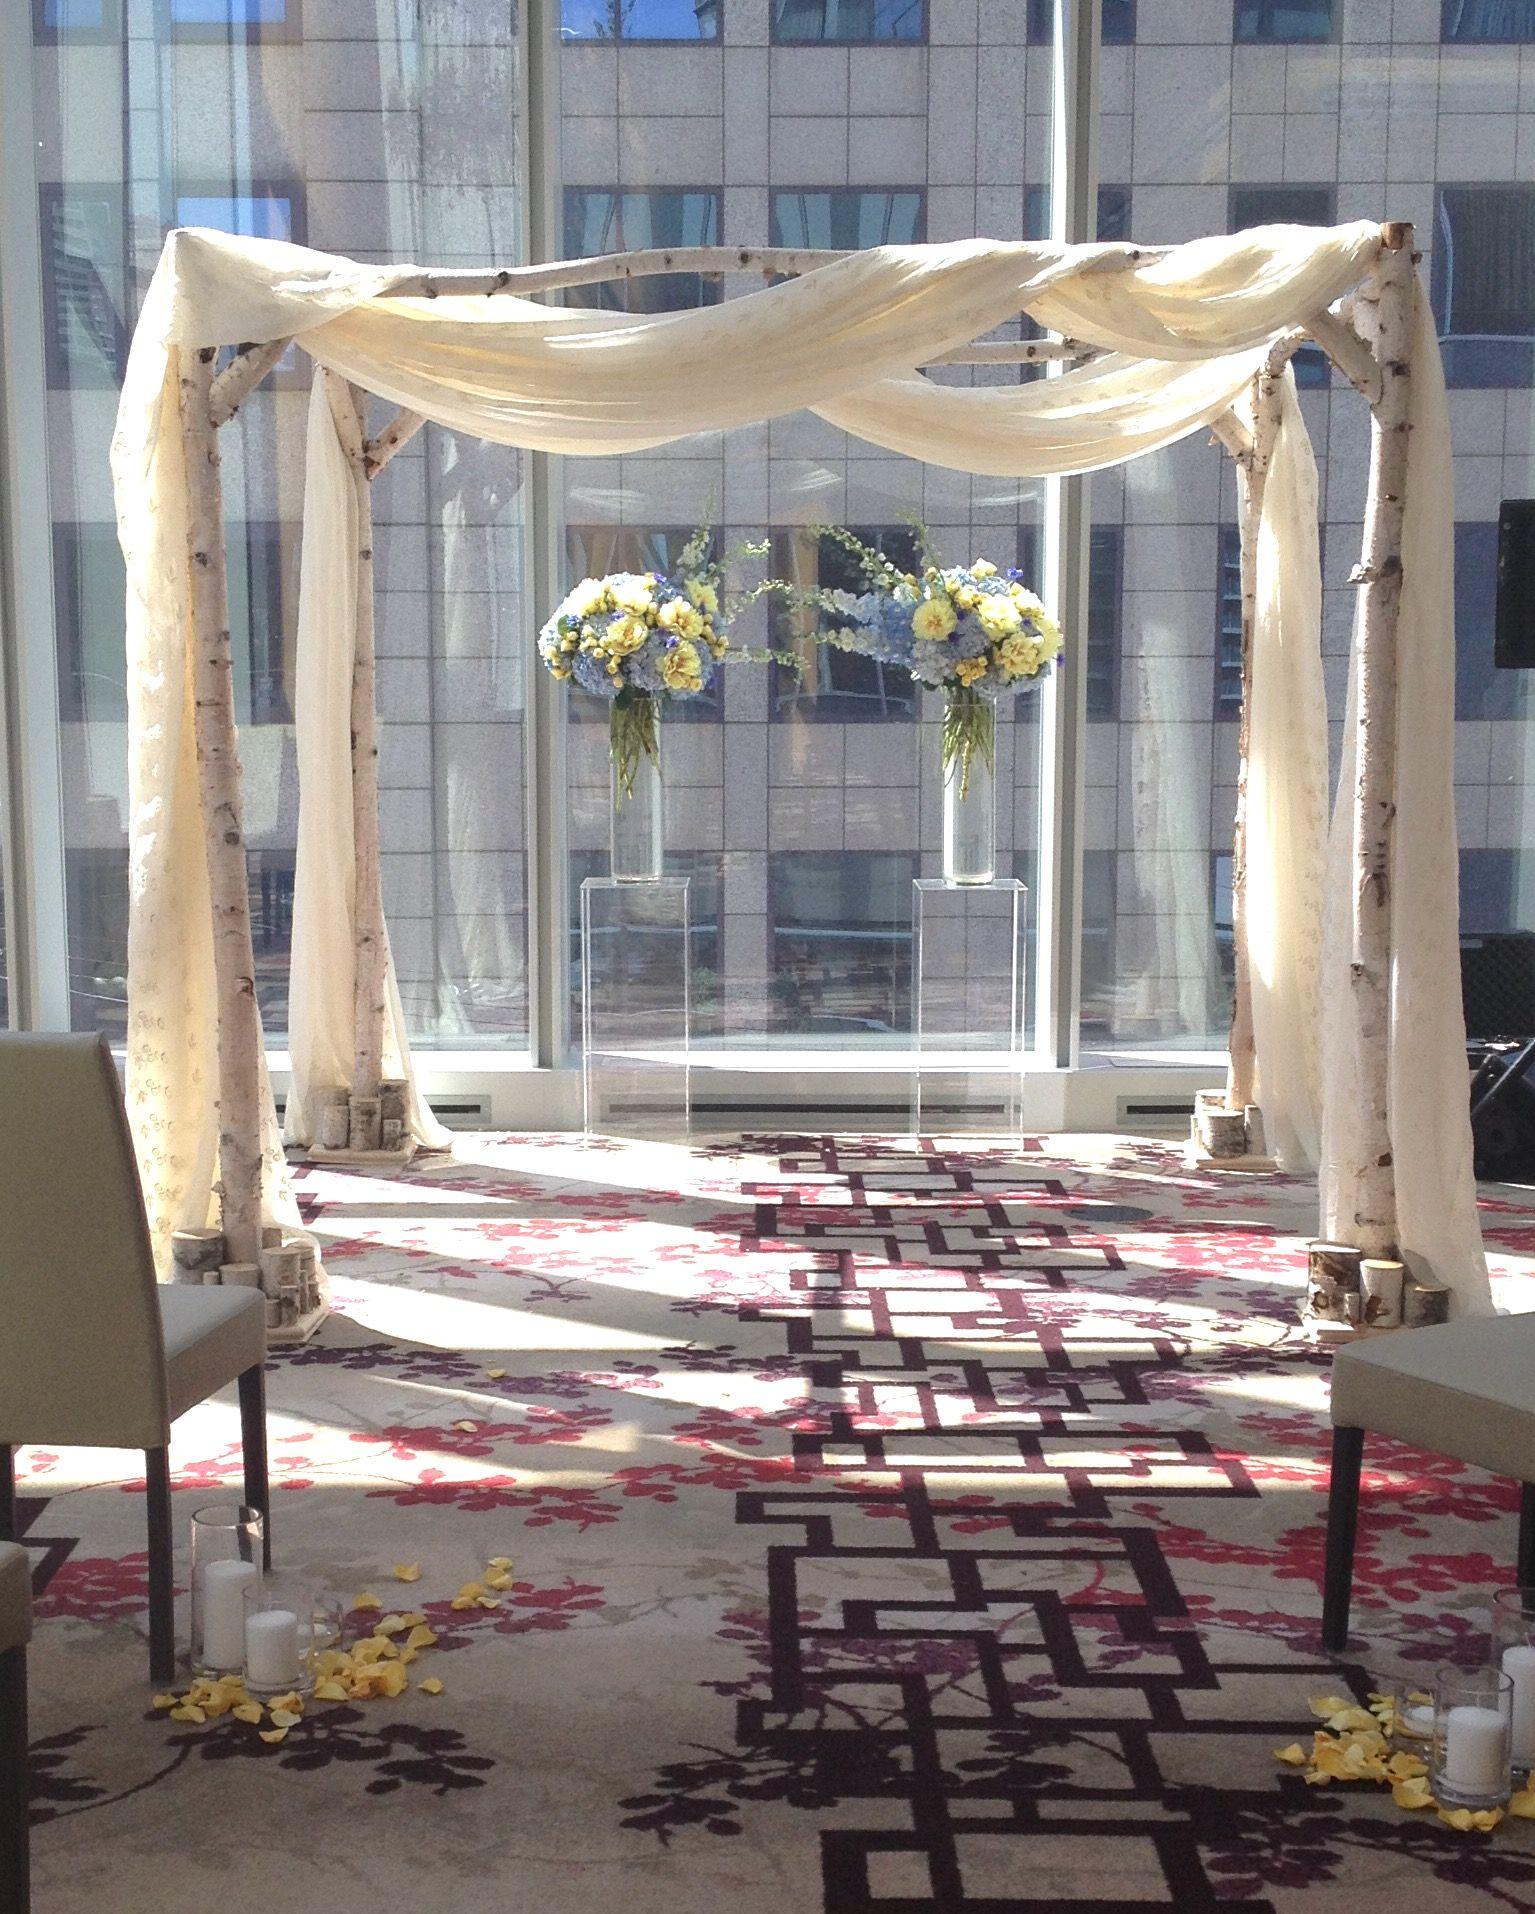 Birch Chuppah With Soft Off White Drapes Shangri La Hotel Toronto By Www Chuppah Ca Chuppah Birch Chuppah Huppah Wedding